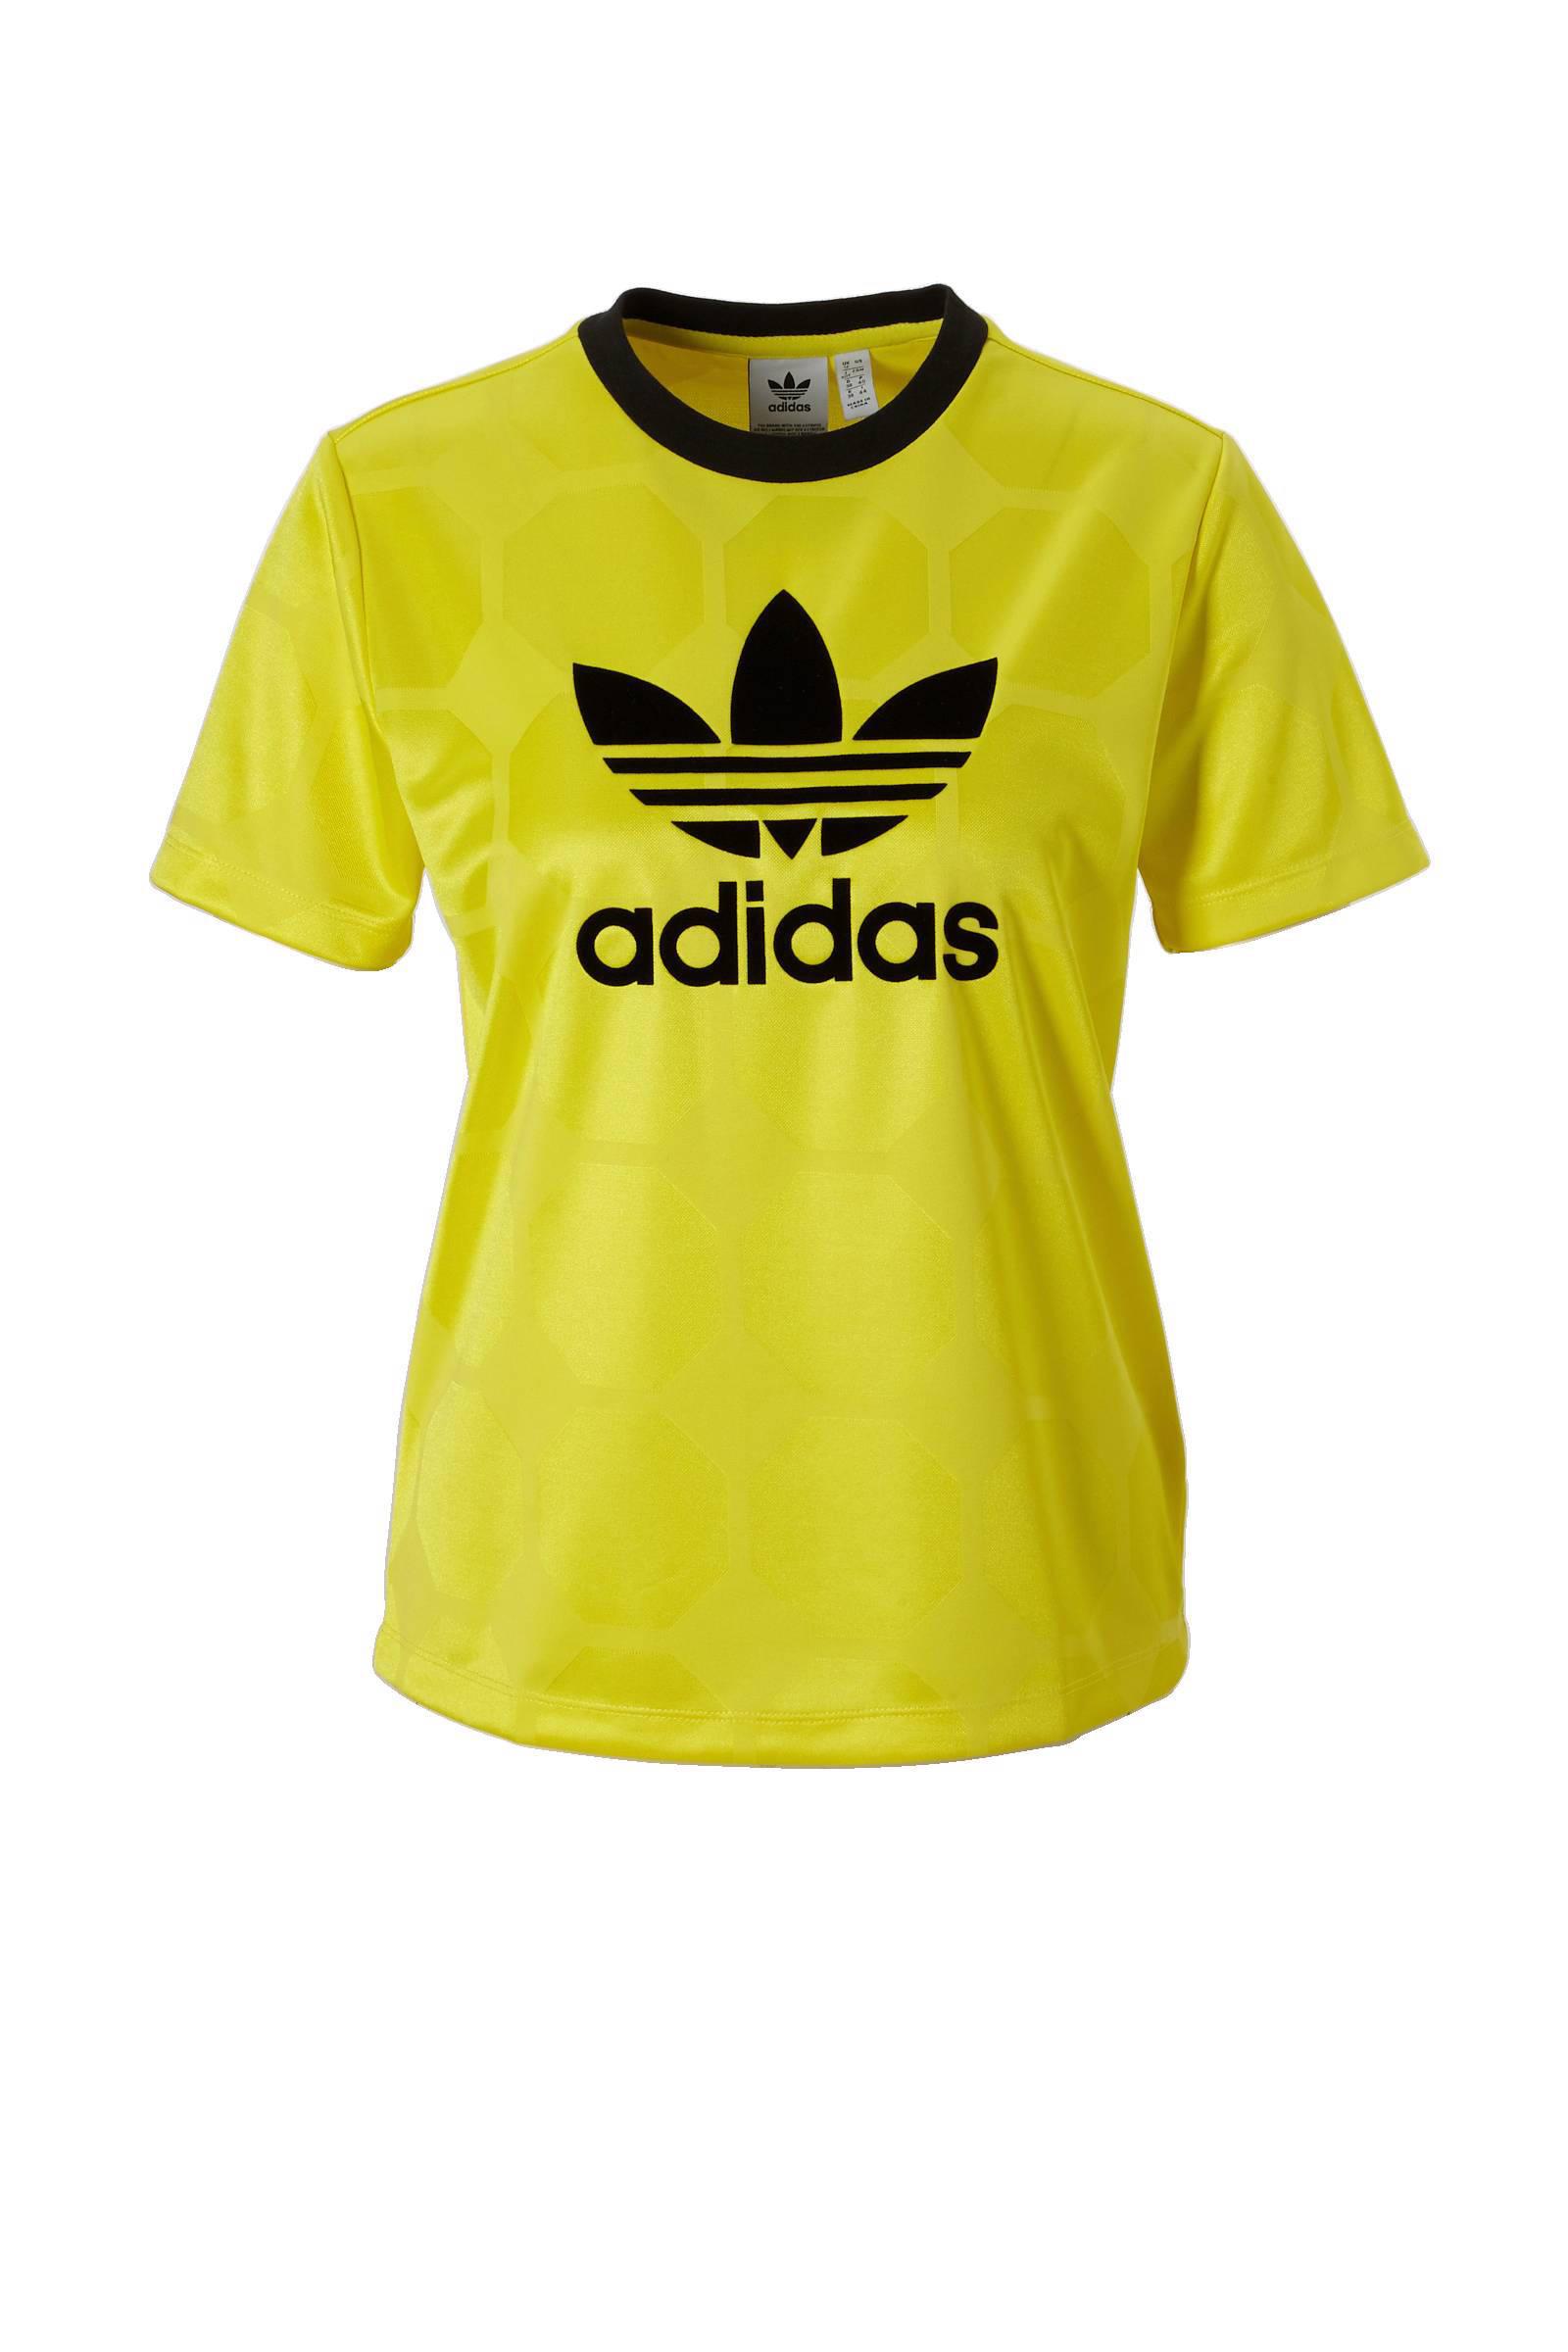 adidas Originals T-shirt geel